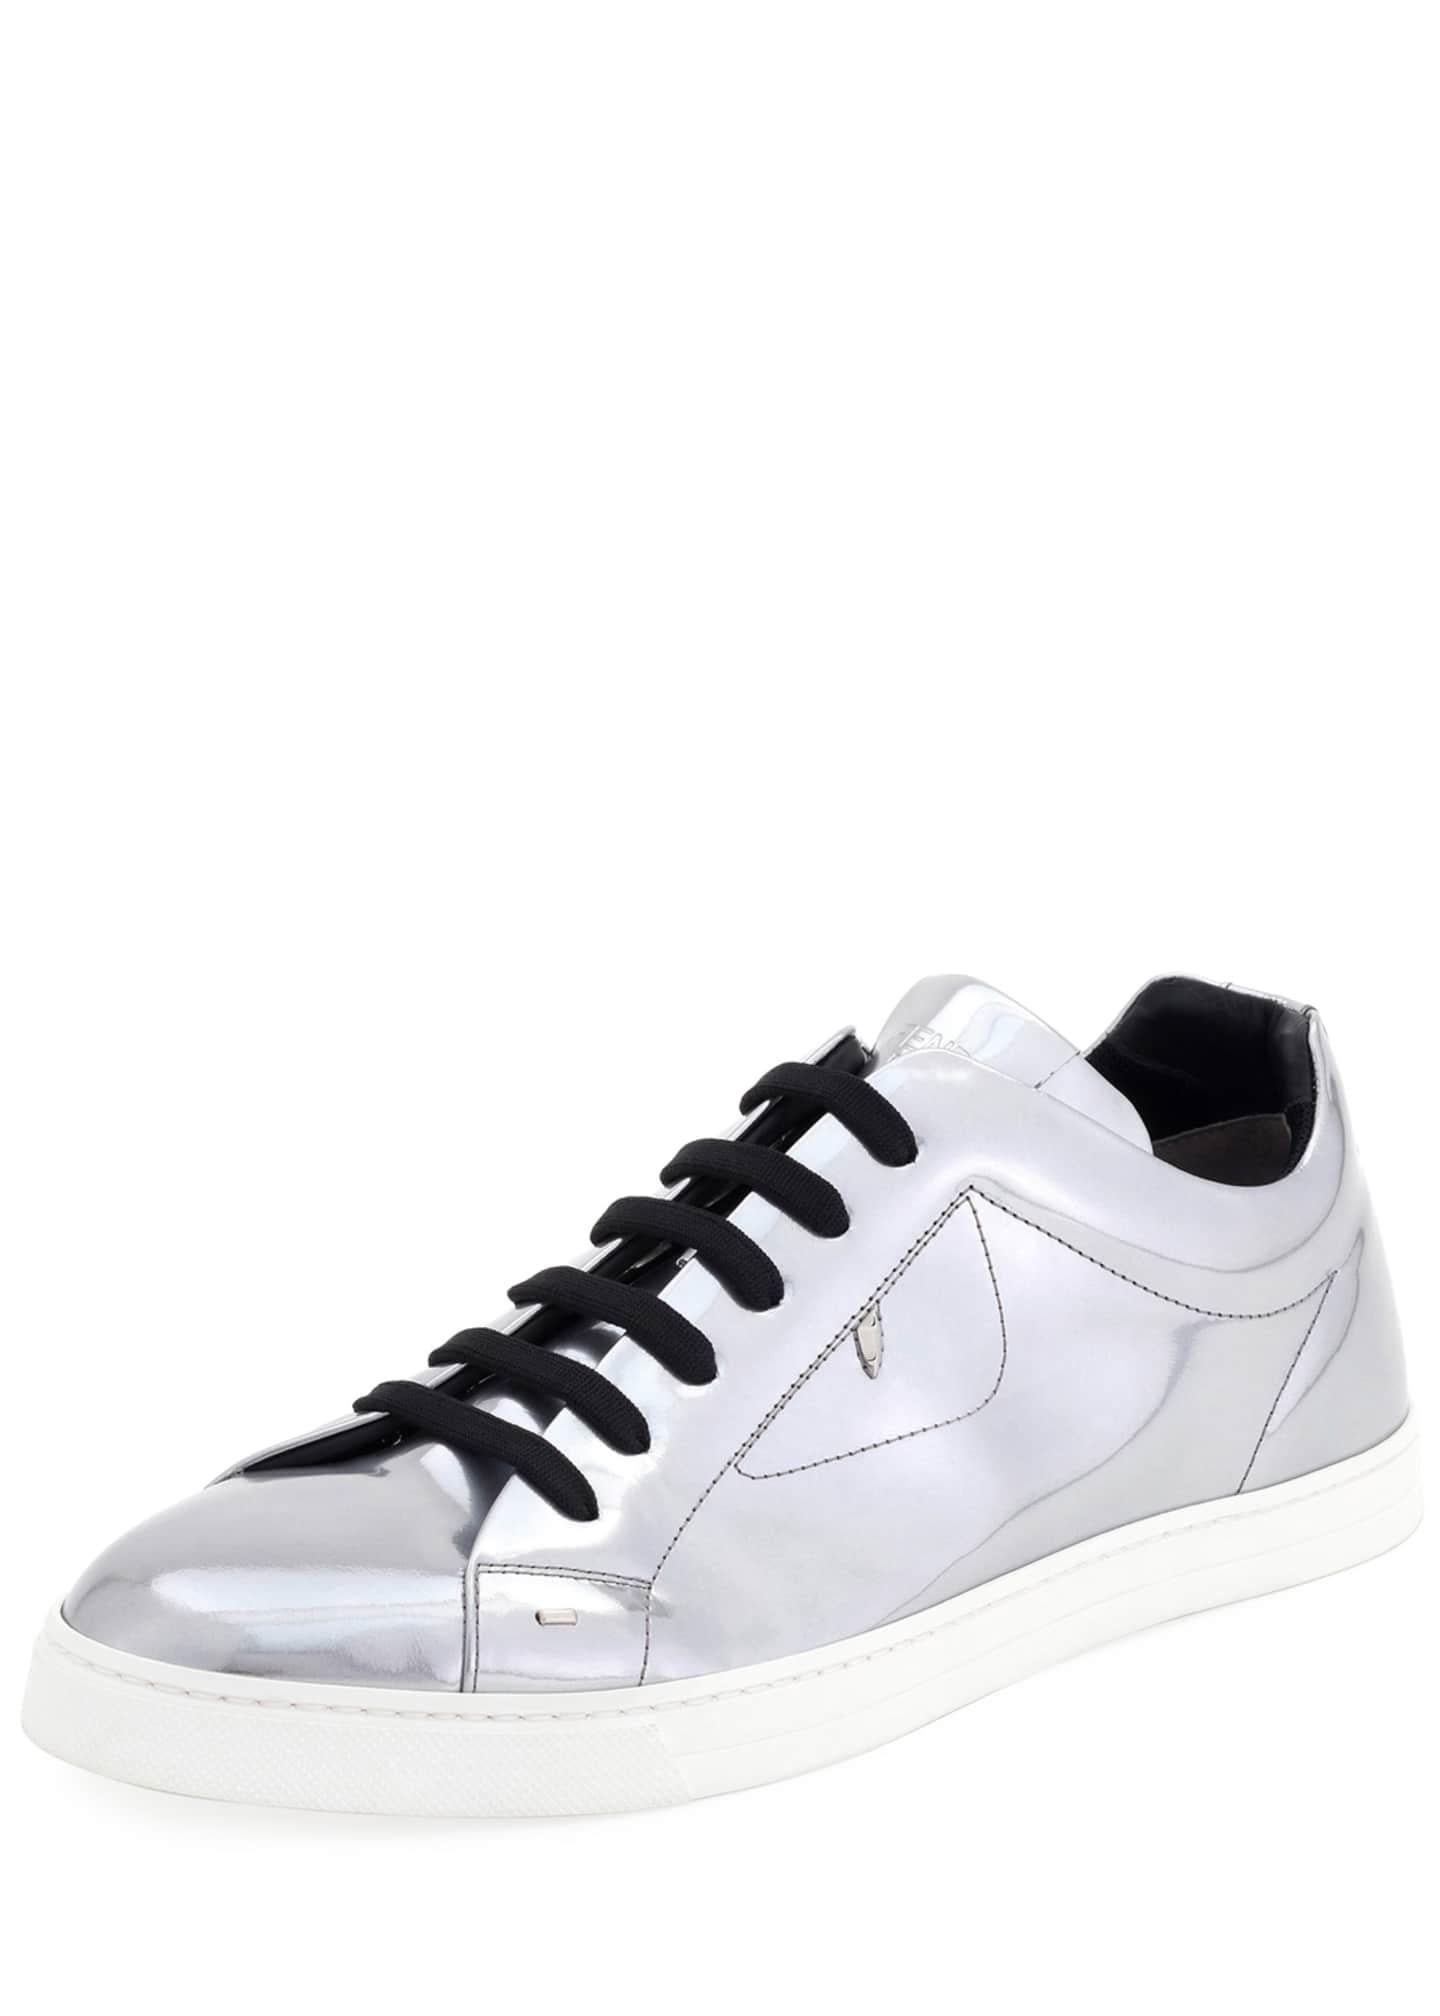 Fendi Men's Bag Bugs Metallic Leather Low-Top Sneakers,